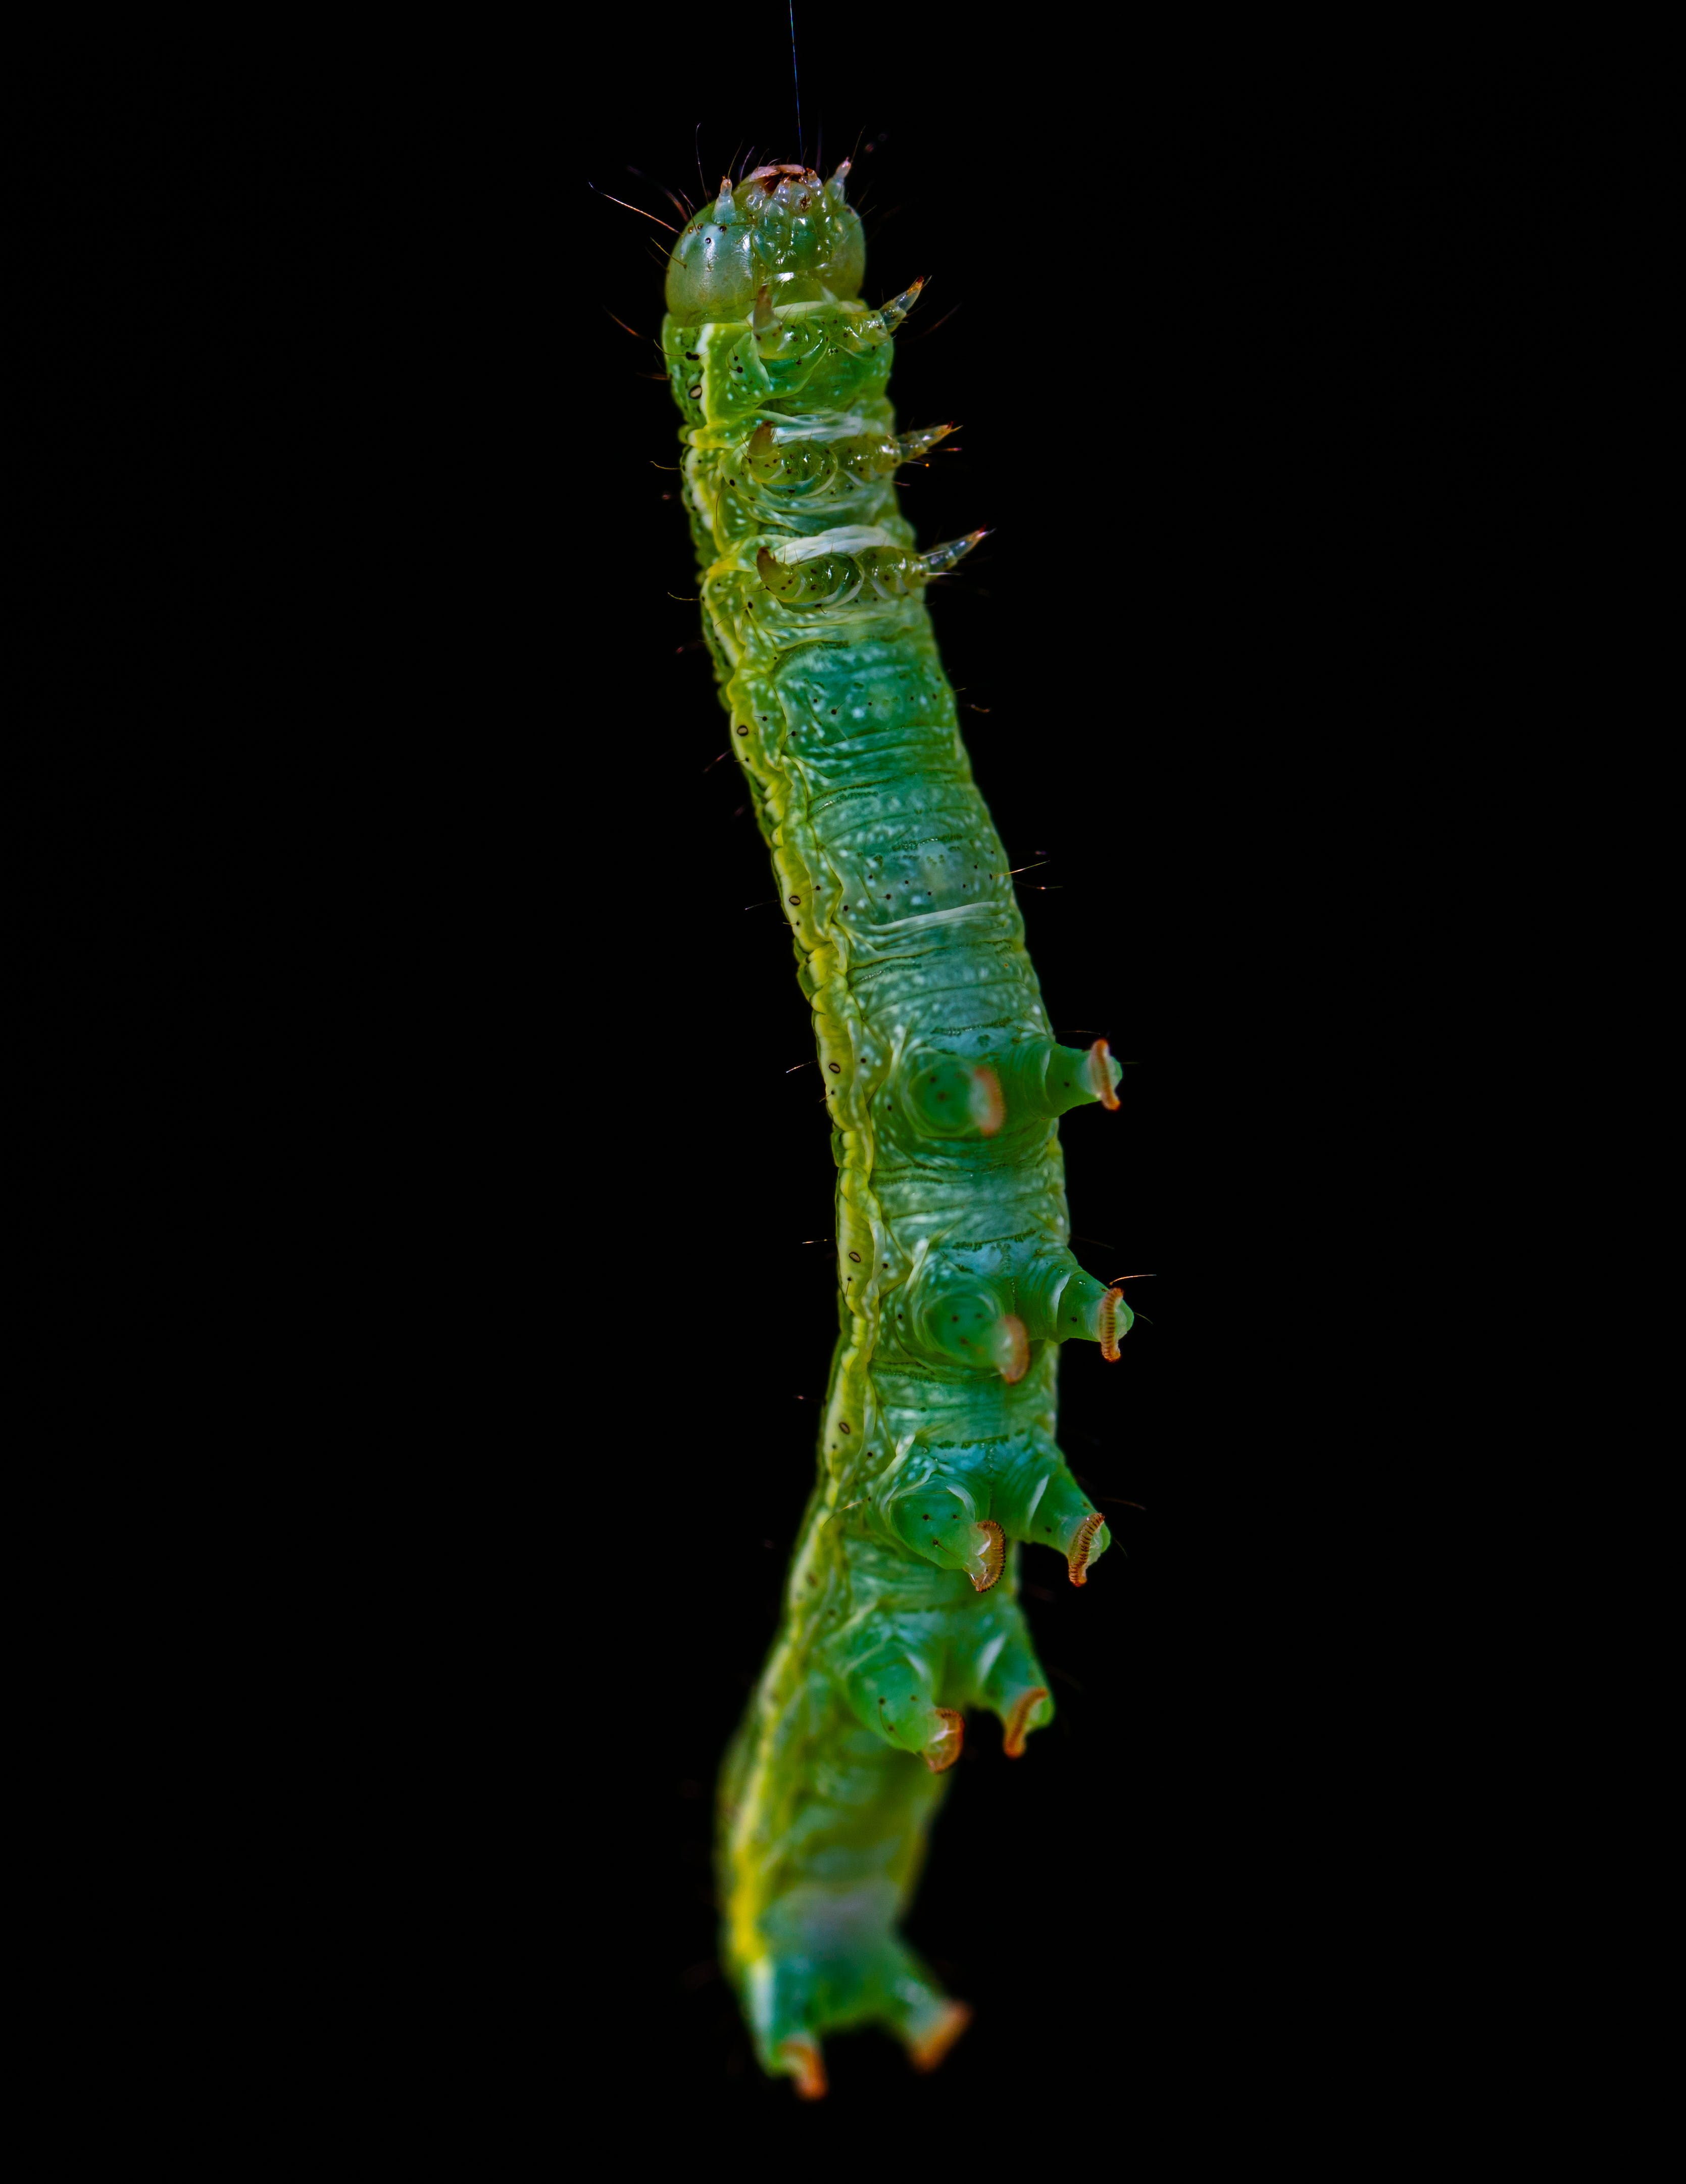 animal, black background, caterpillar